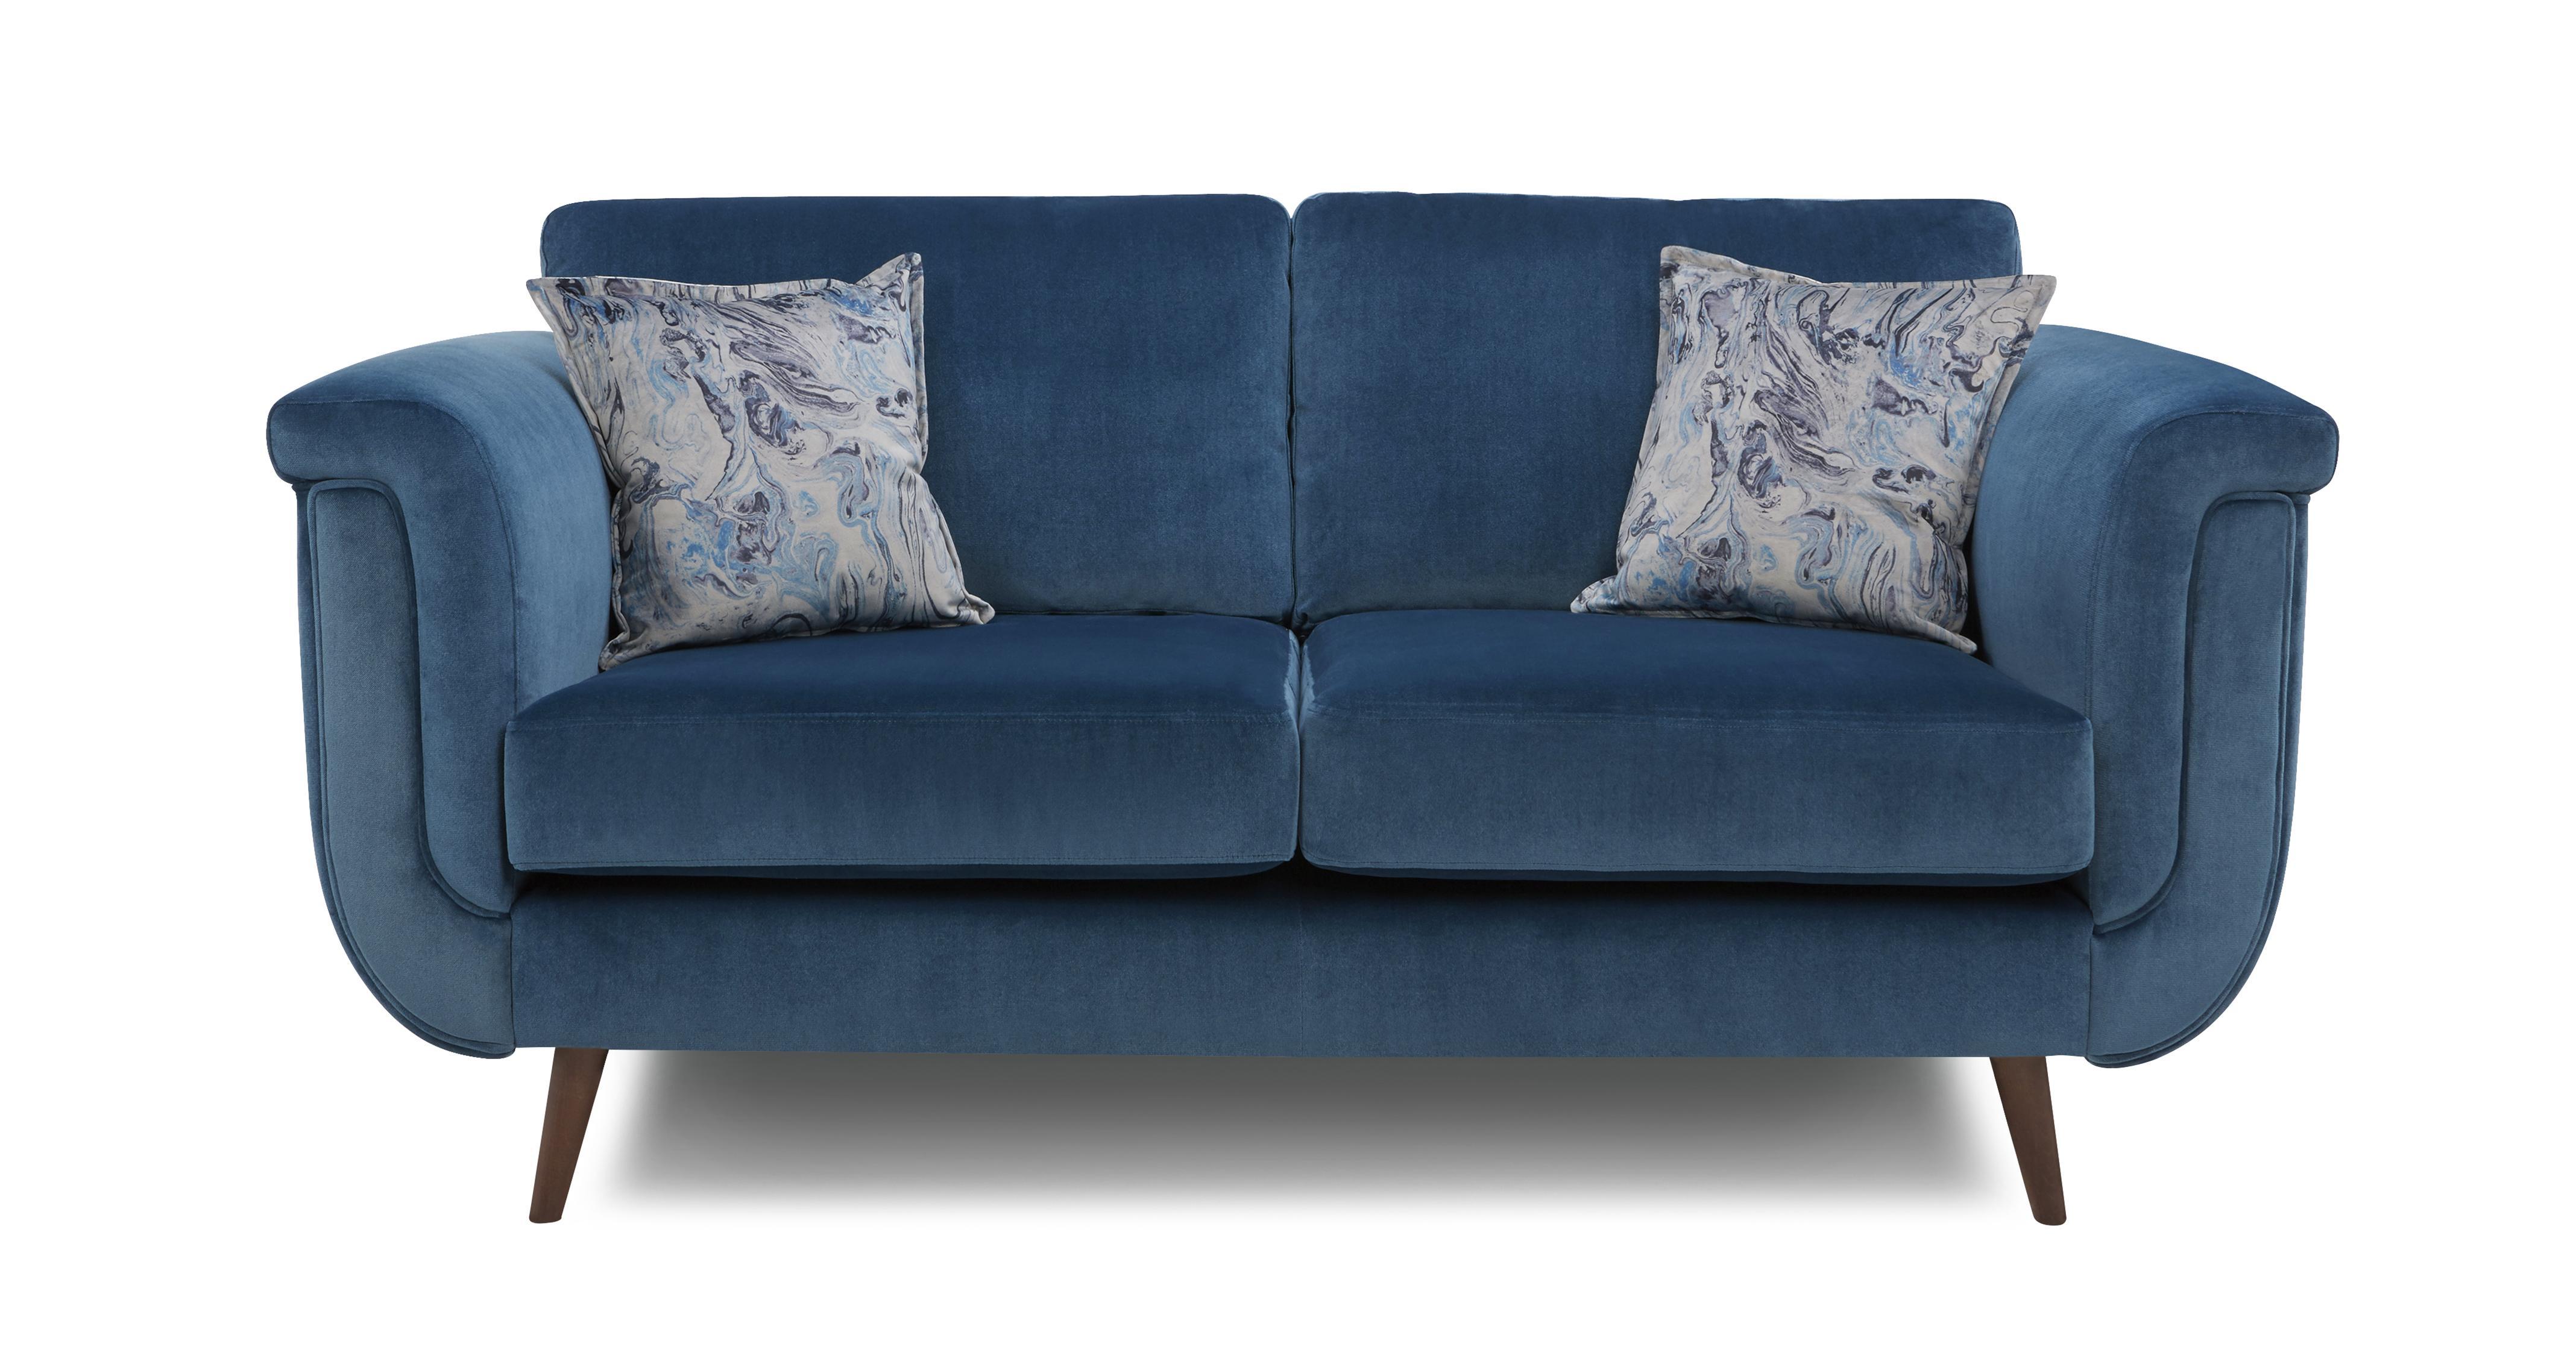 dfs sofa reviews 2018 seat cushion covers diy topaz clearance medium  